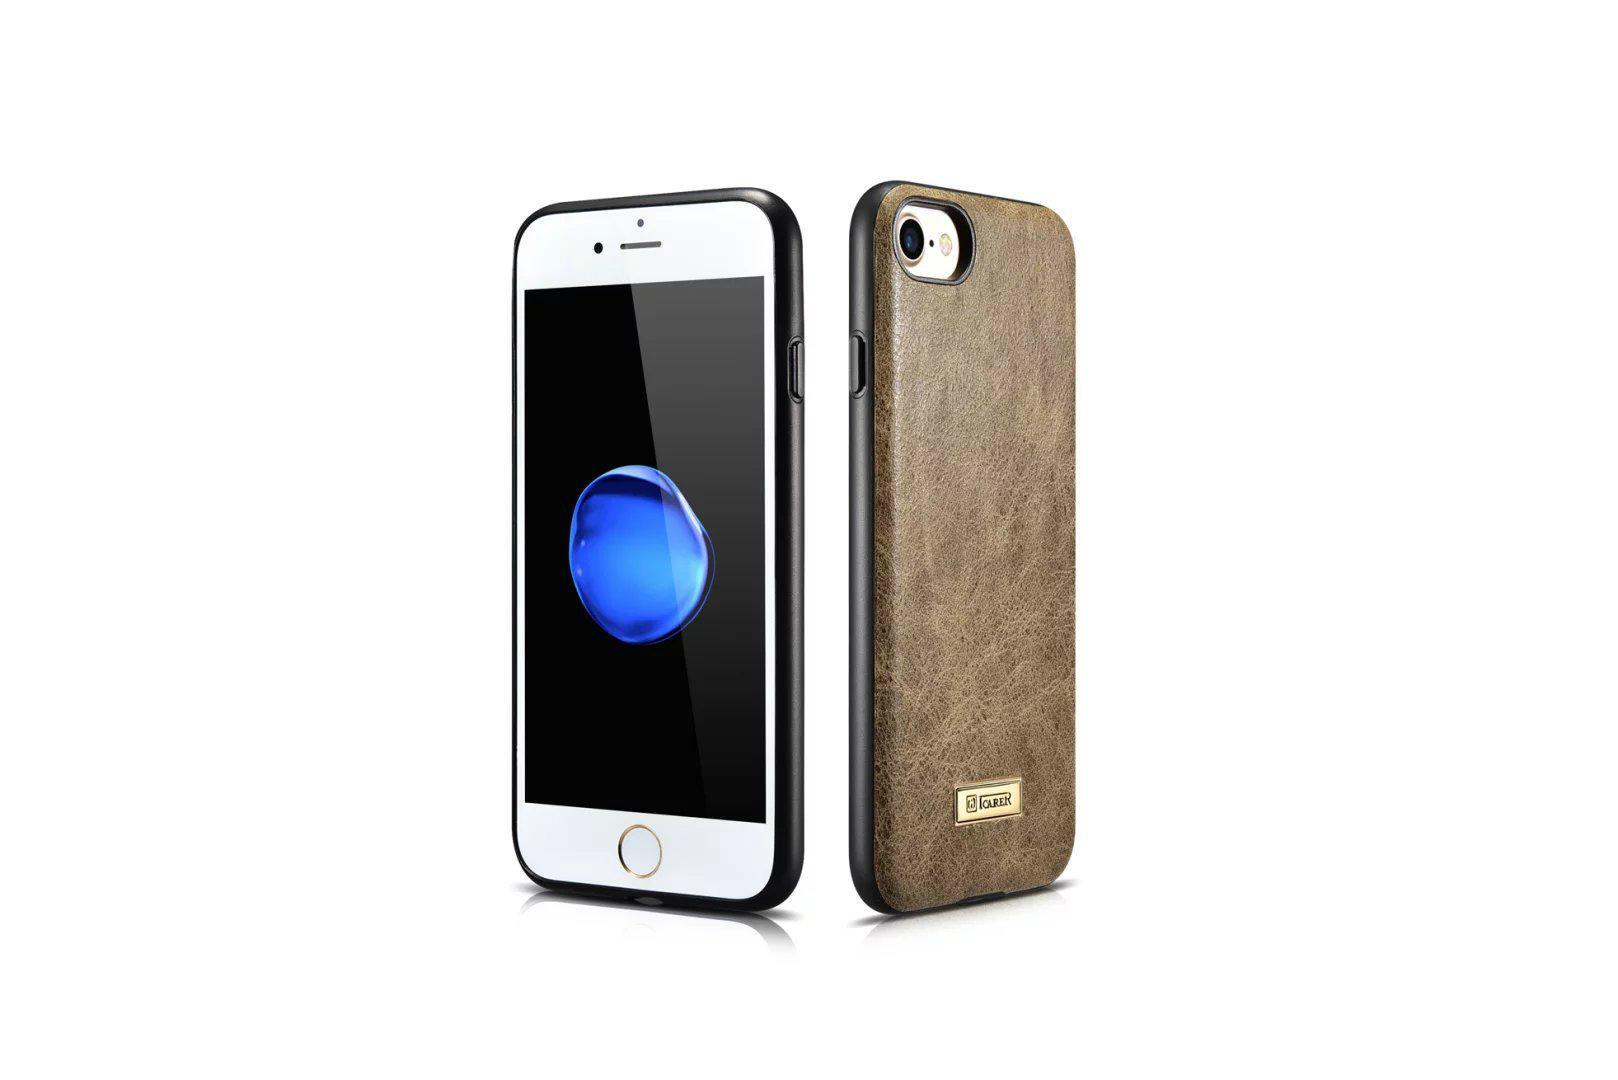 iCarer iPhone 7 Shenzhou Genuine Leather Fashional Back Cover Case 6